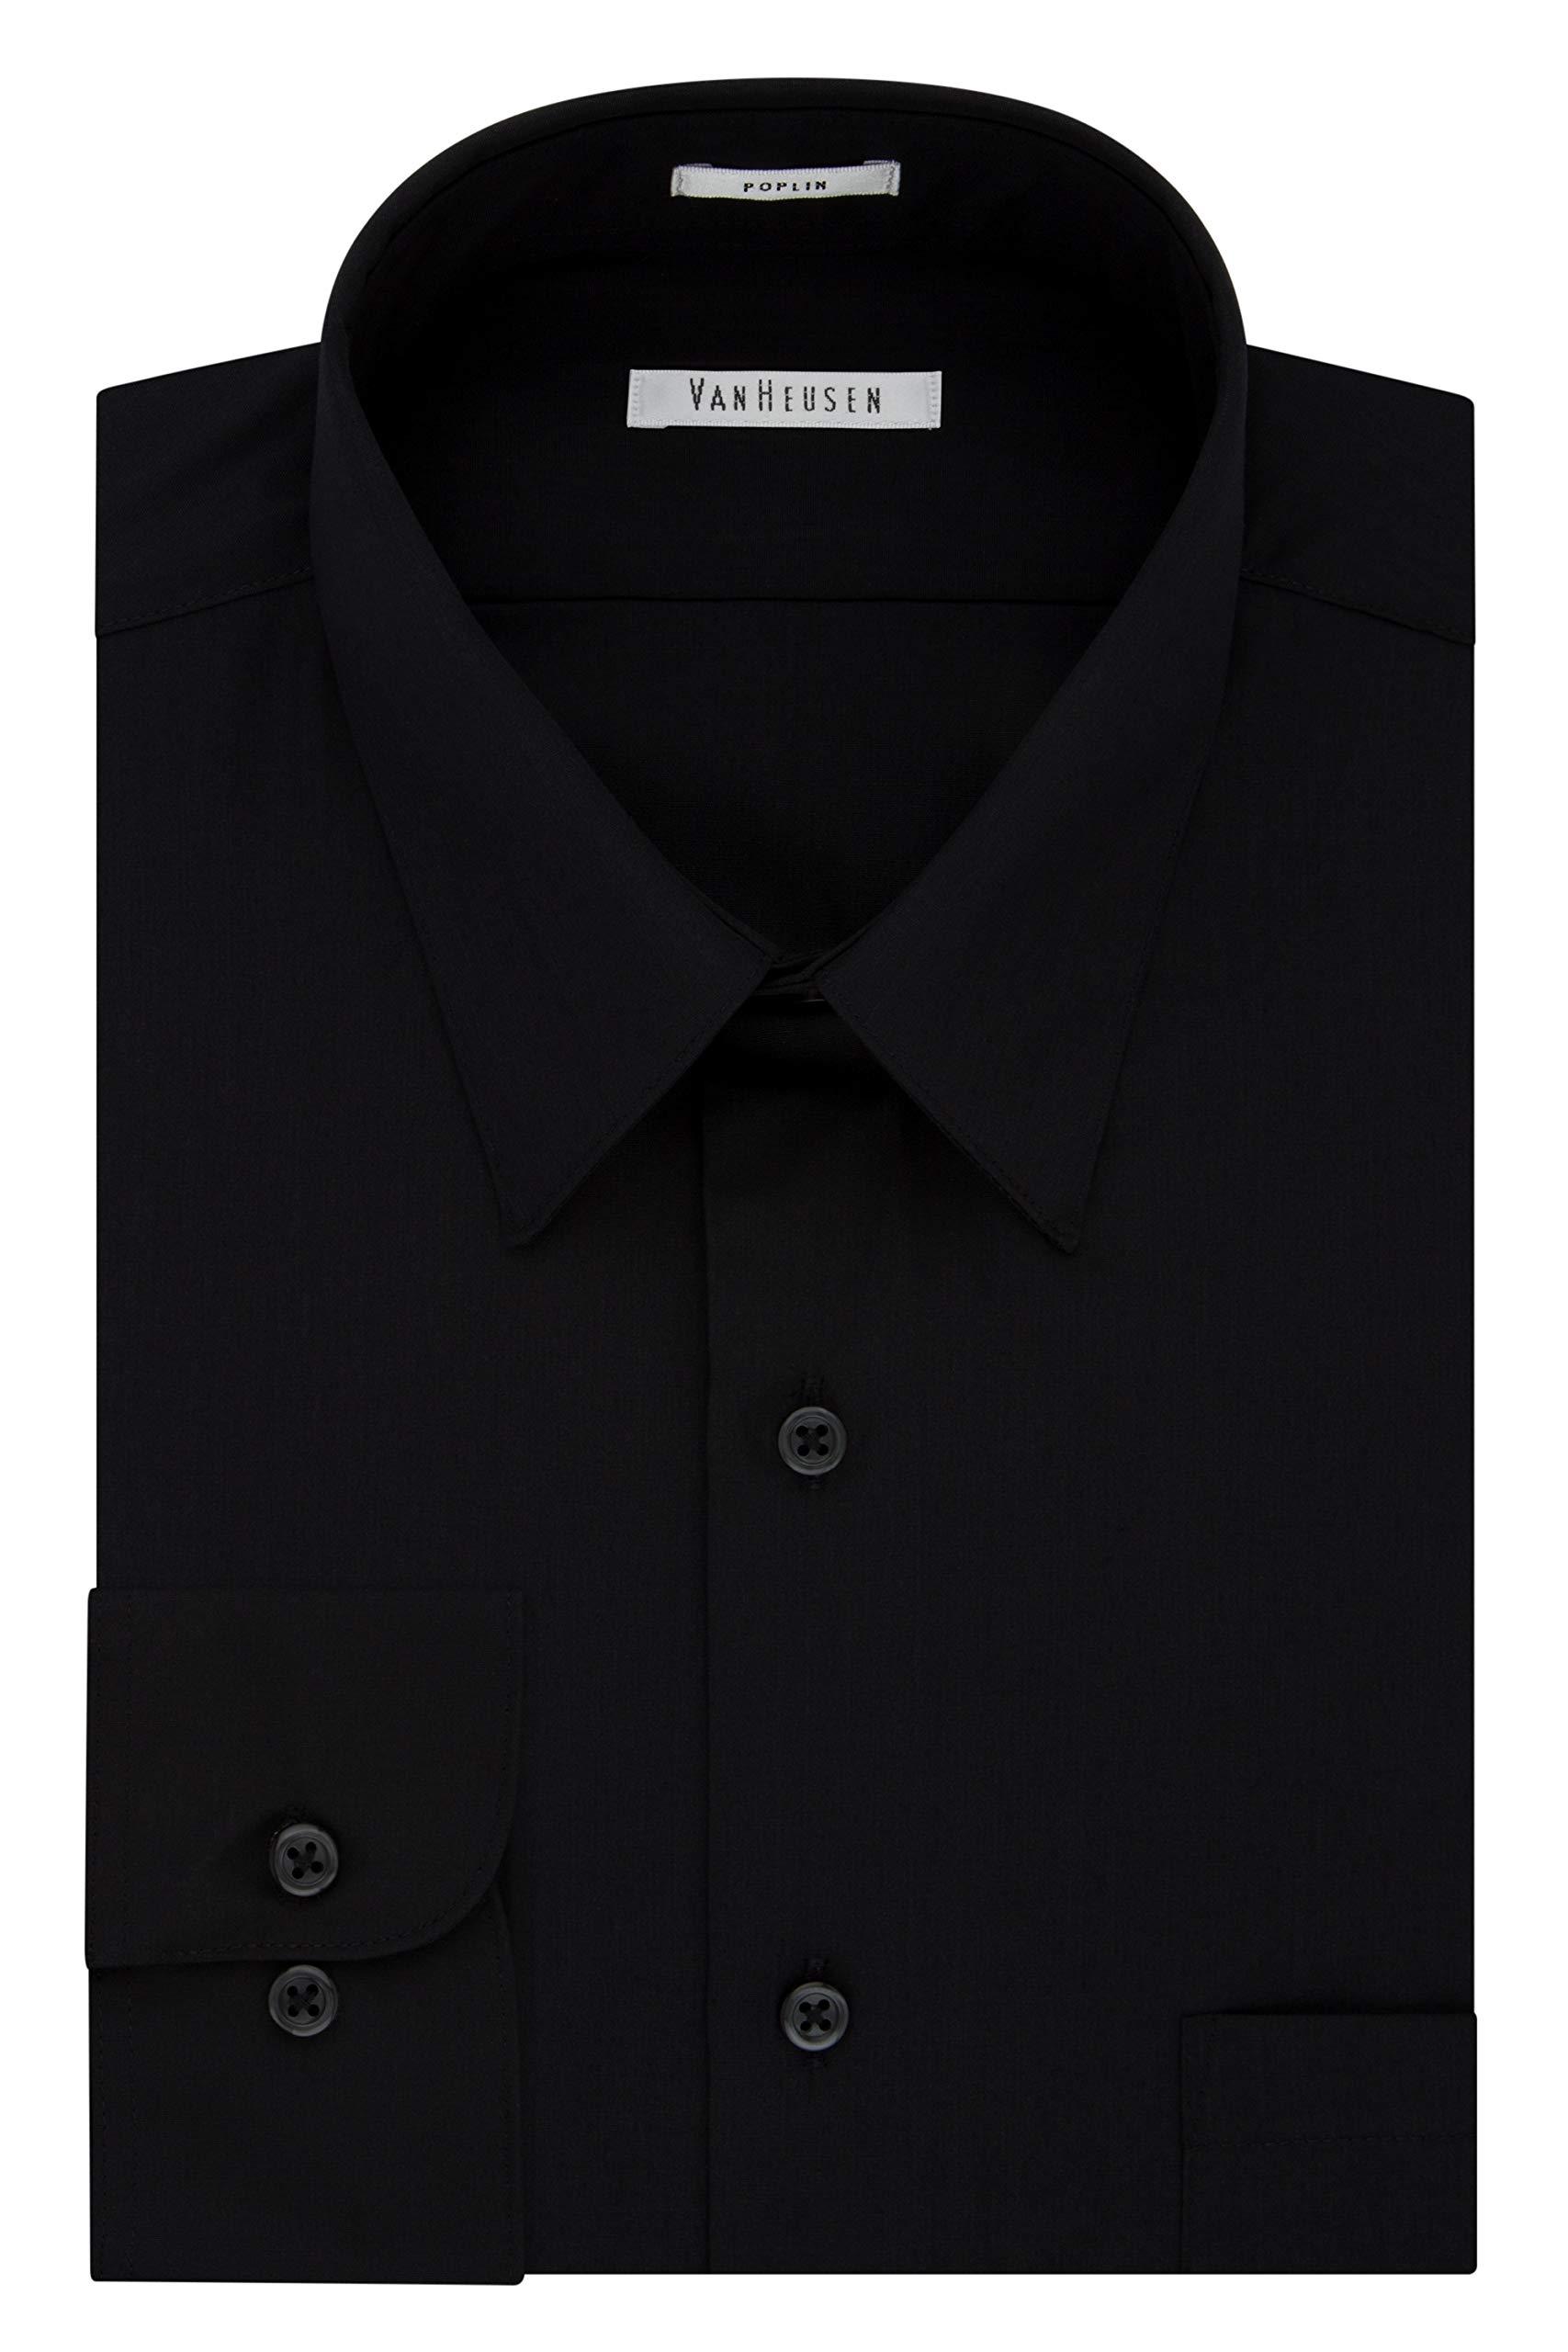 Van Heusen Men's Poplin Regular Fit Solid Point Collar Dress Shirt, Black, 17'' Neck 36''-37'' Sleeve